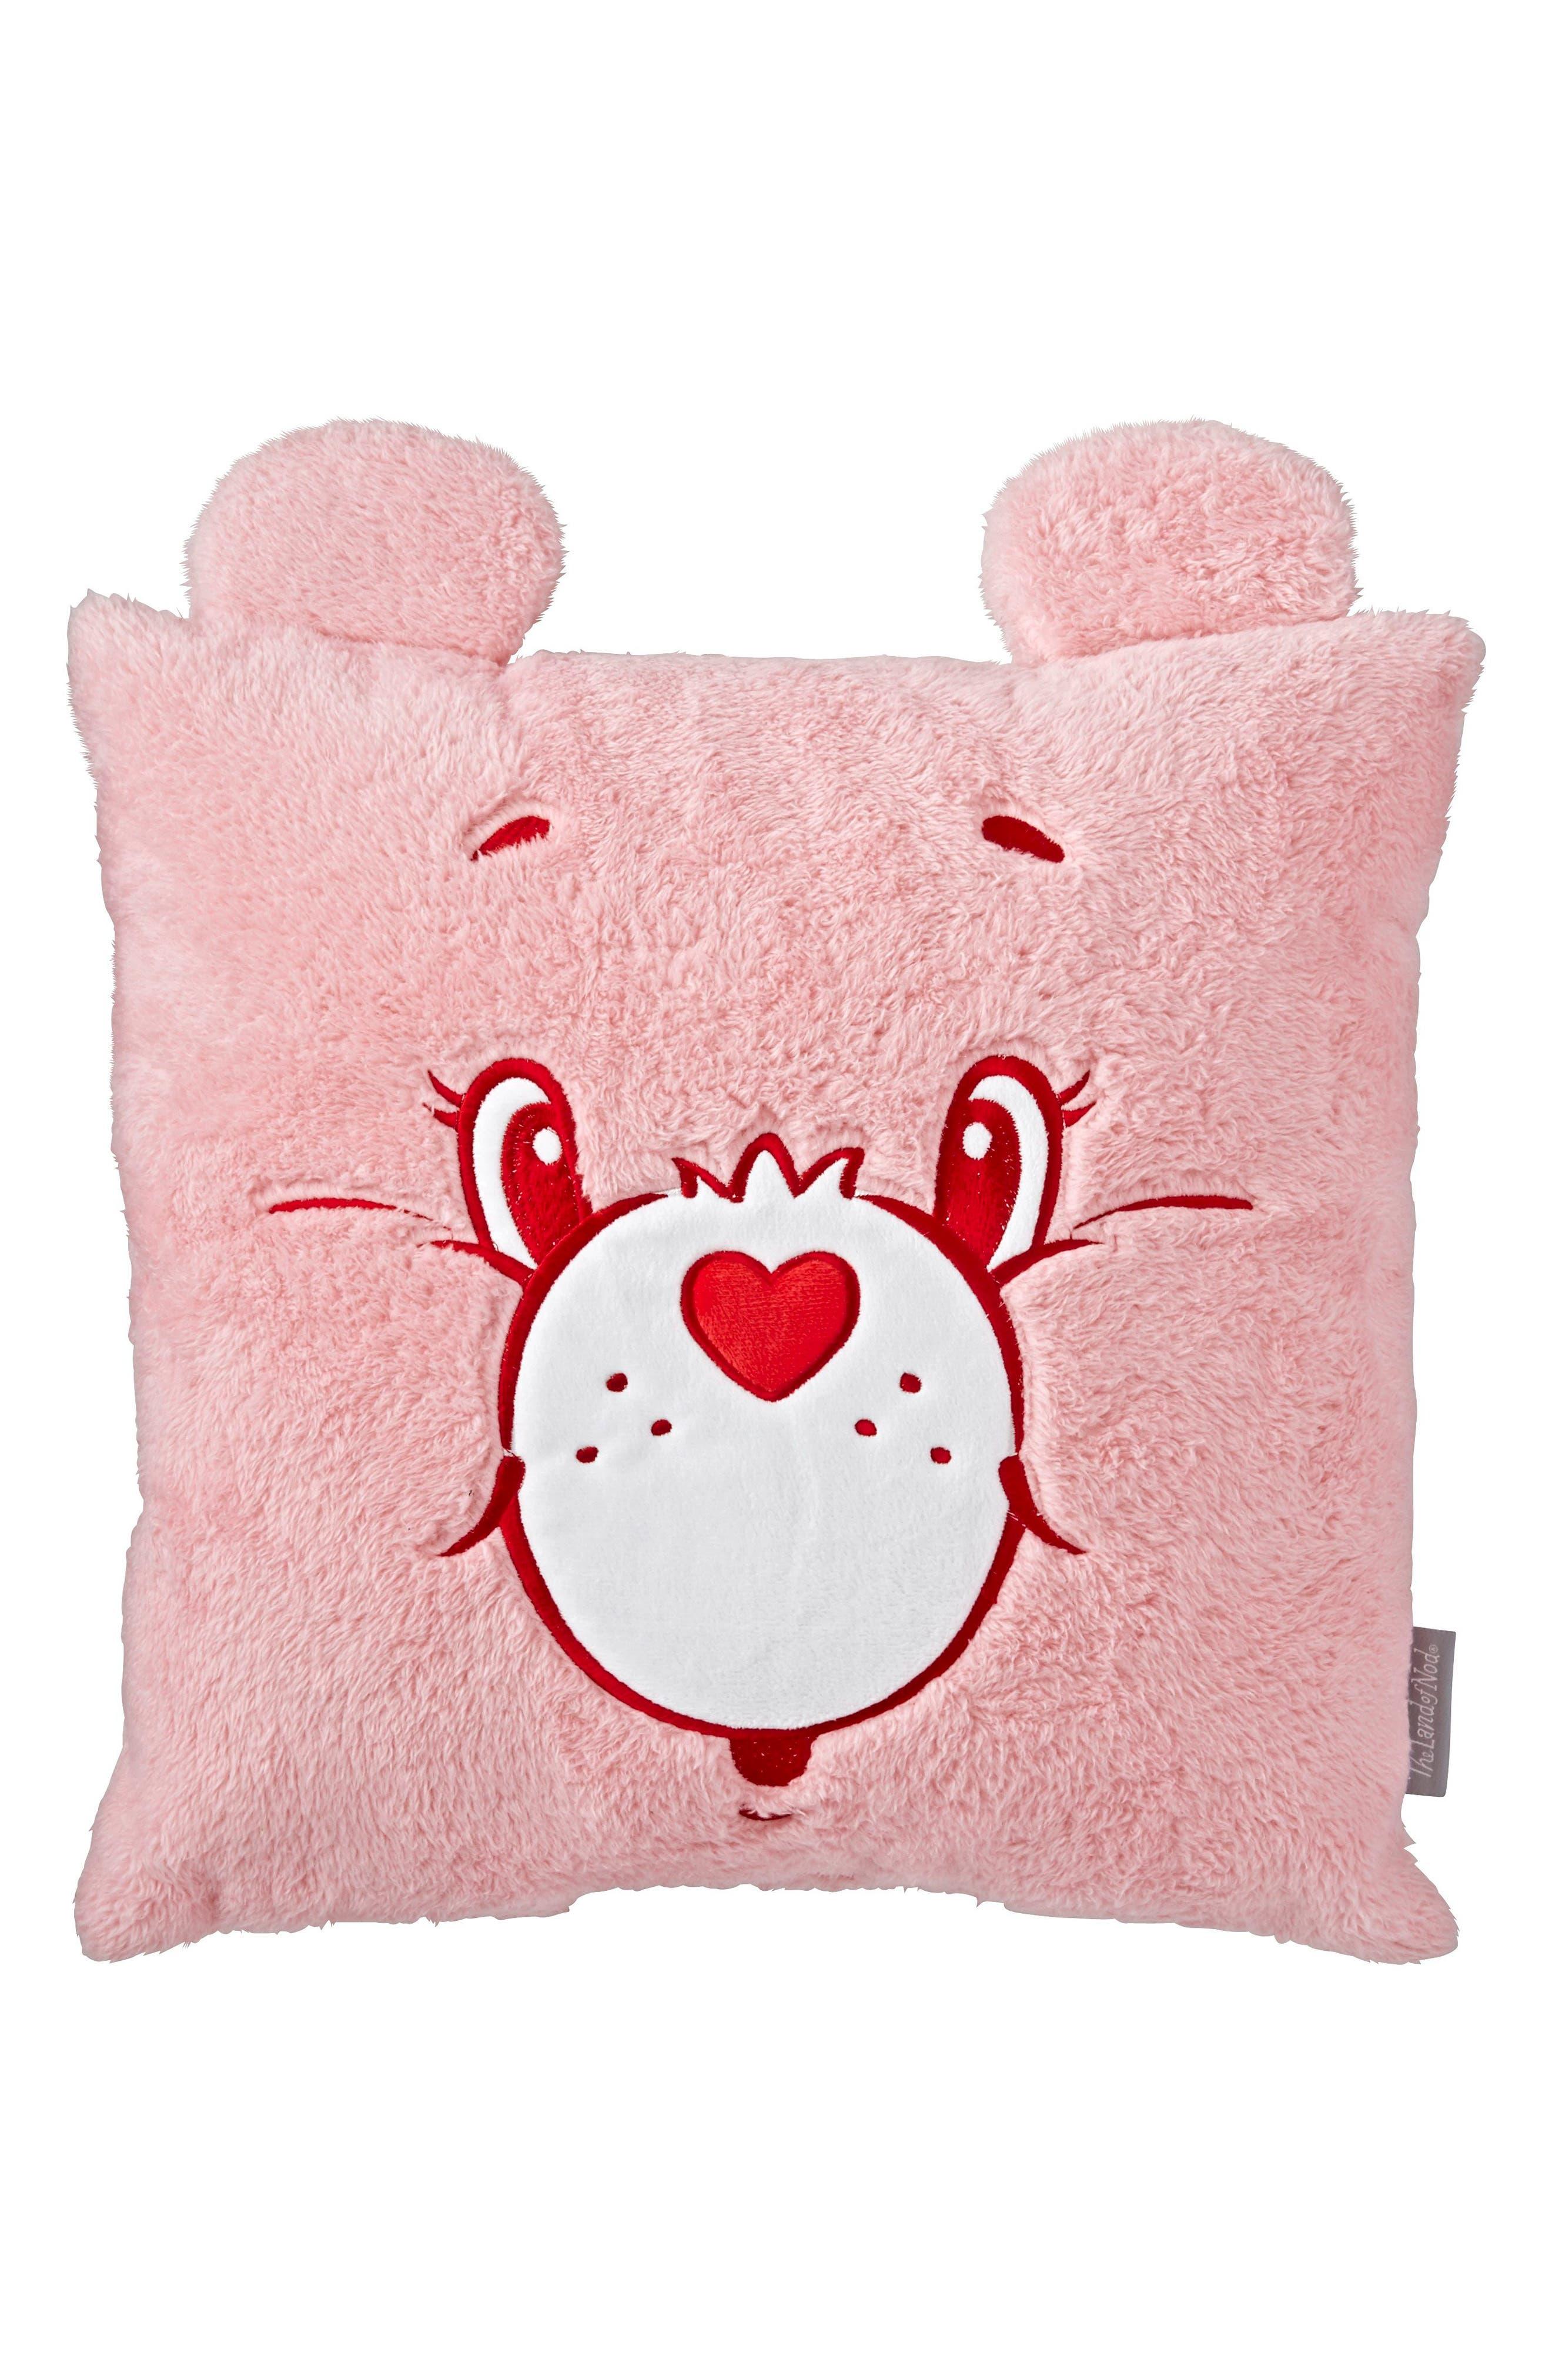 The Land of Nod Care Bears™ Throw Pillow